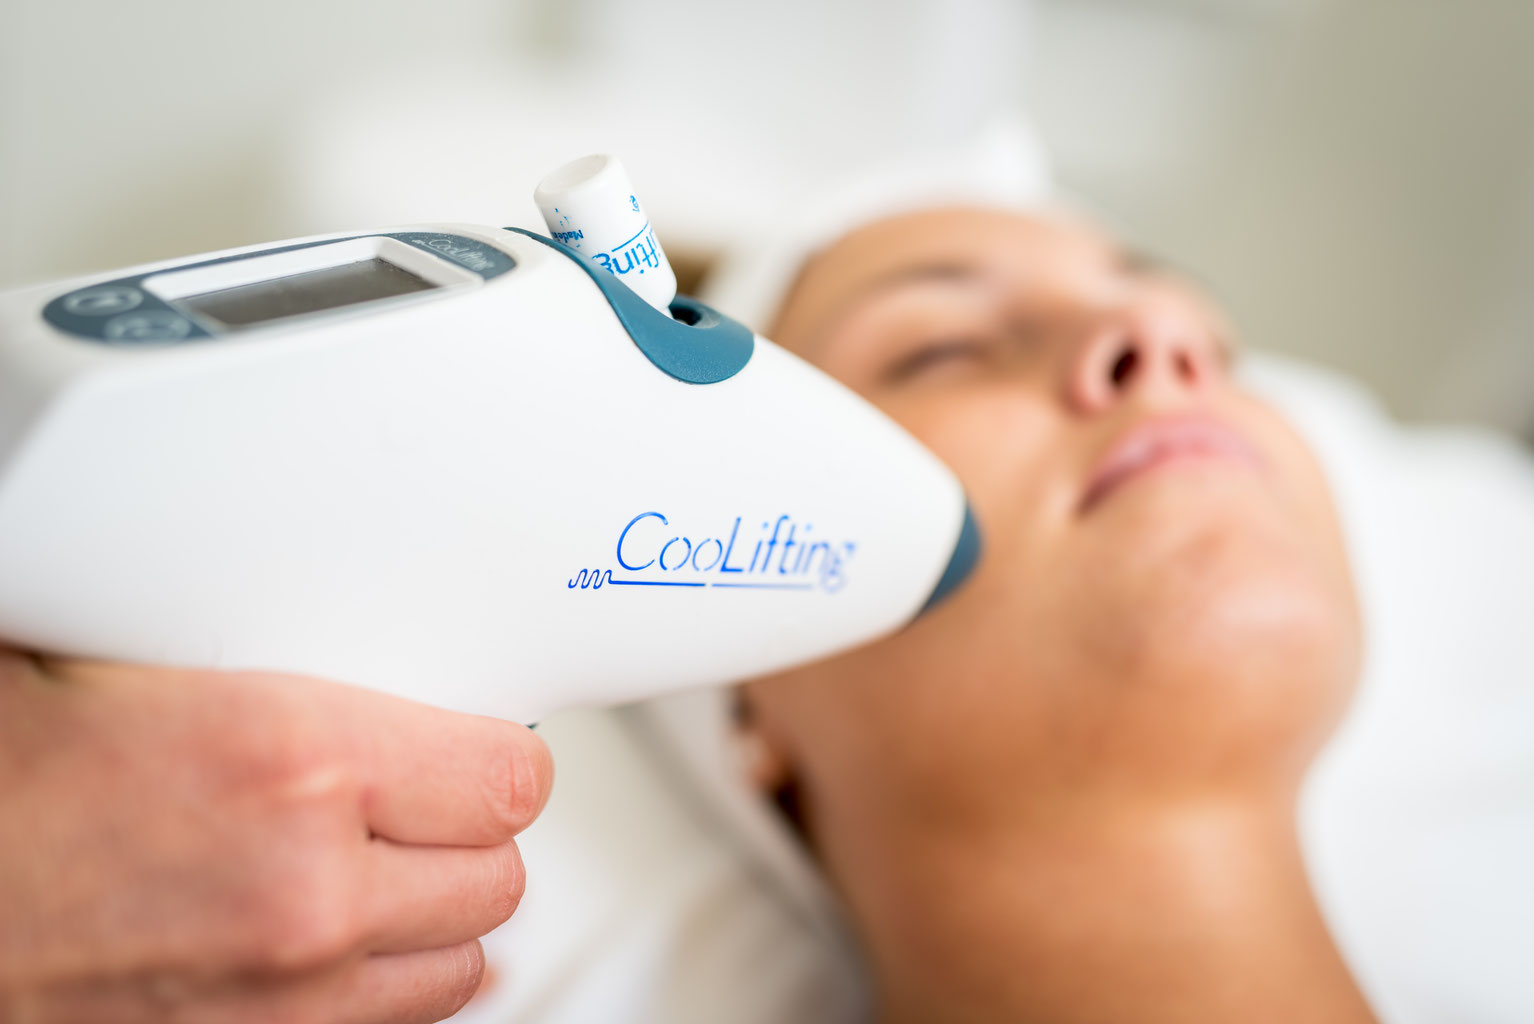 CooLifting - Straffe Haut in wenigen Minuten - Kosmetik